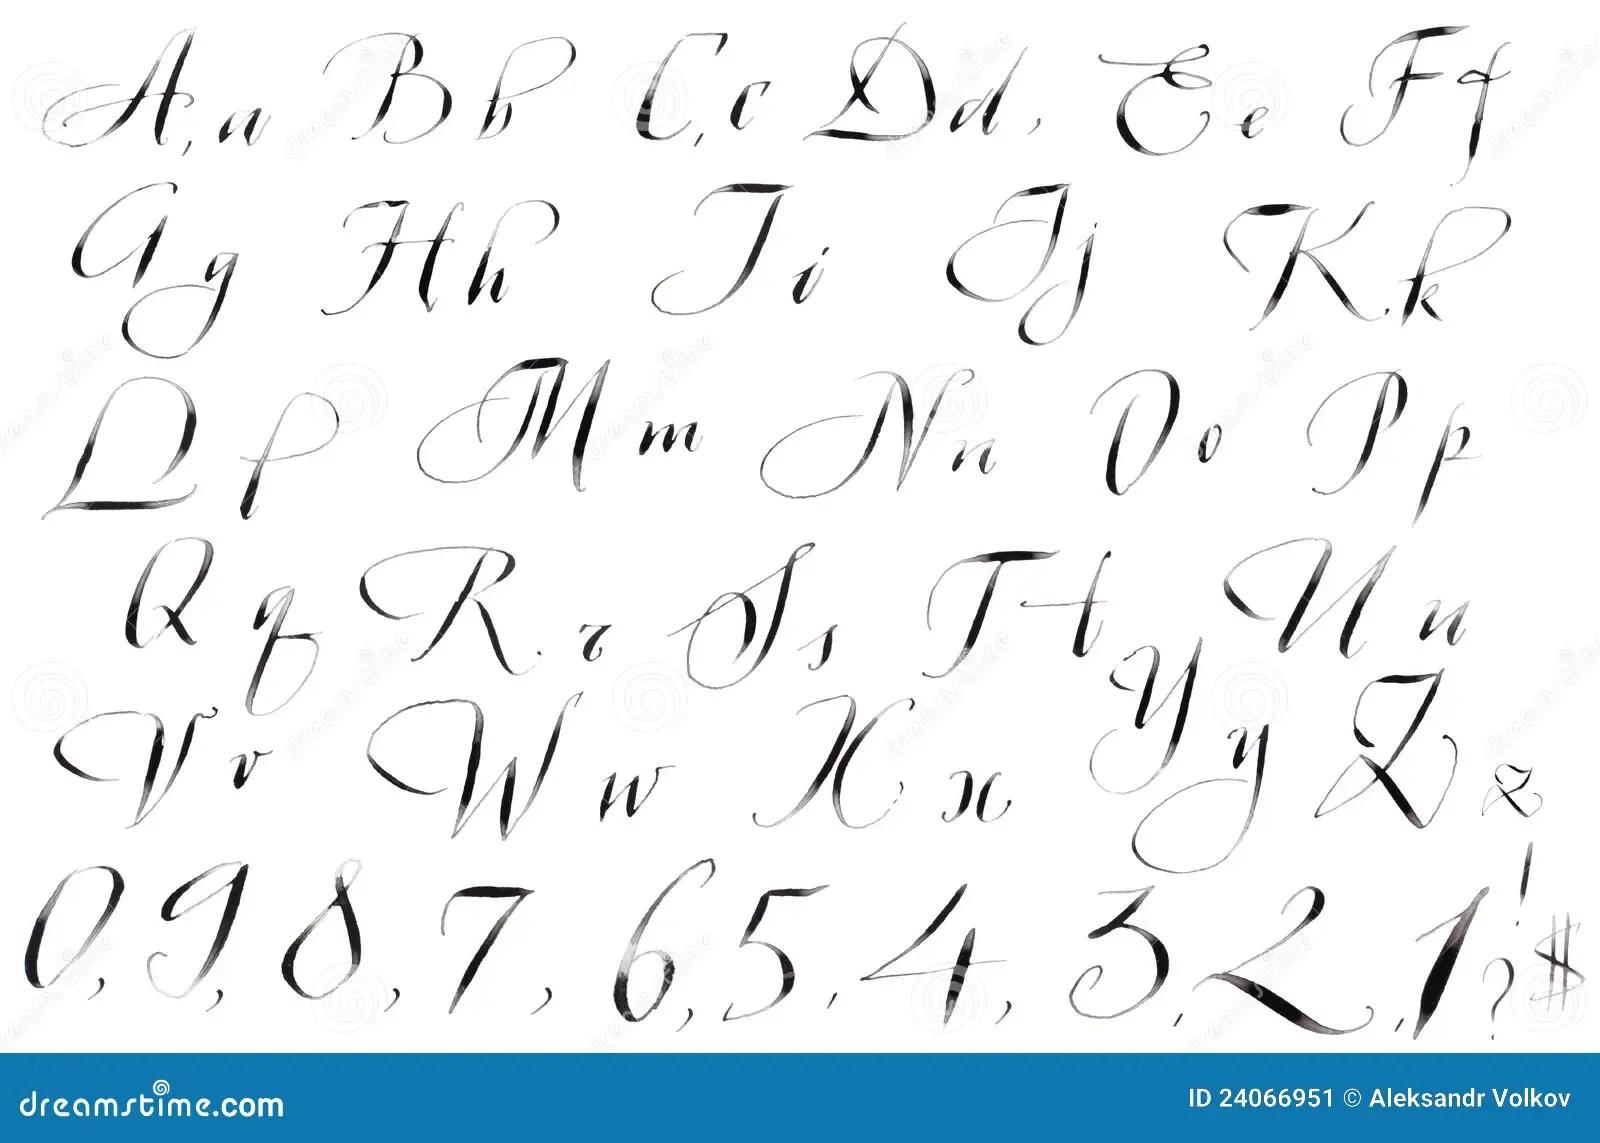 Kalligraphie-handgeschriebenes Alphabet Stock Abbildung